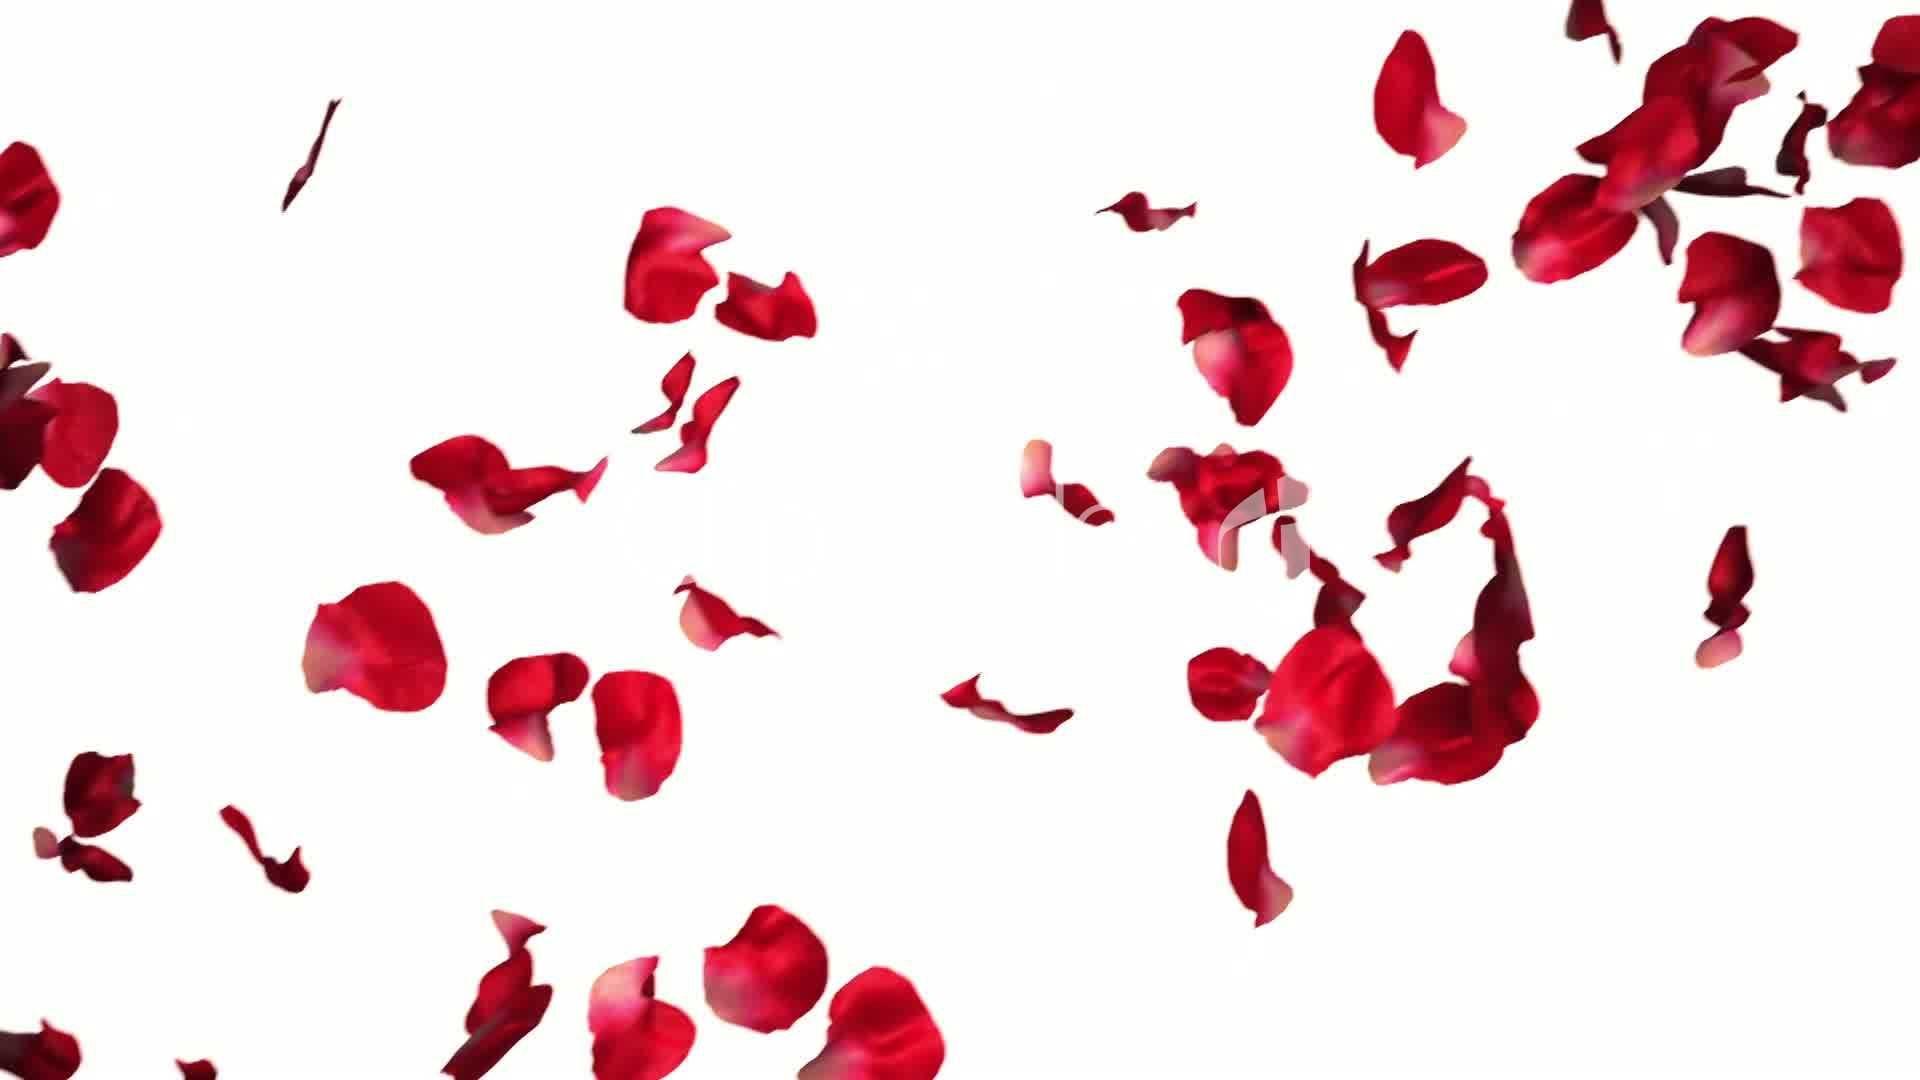 Http En Clipdealer Com Preview Image 001 792 806 Previews 10 1792806 Rose 20petals 20falling 20in 20slow 20motion Rose Petals Falling Red Rose Petals Petals